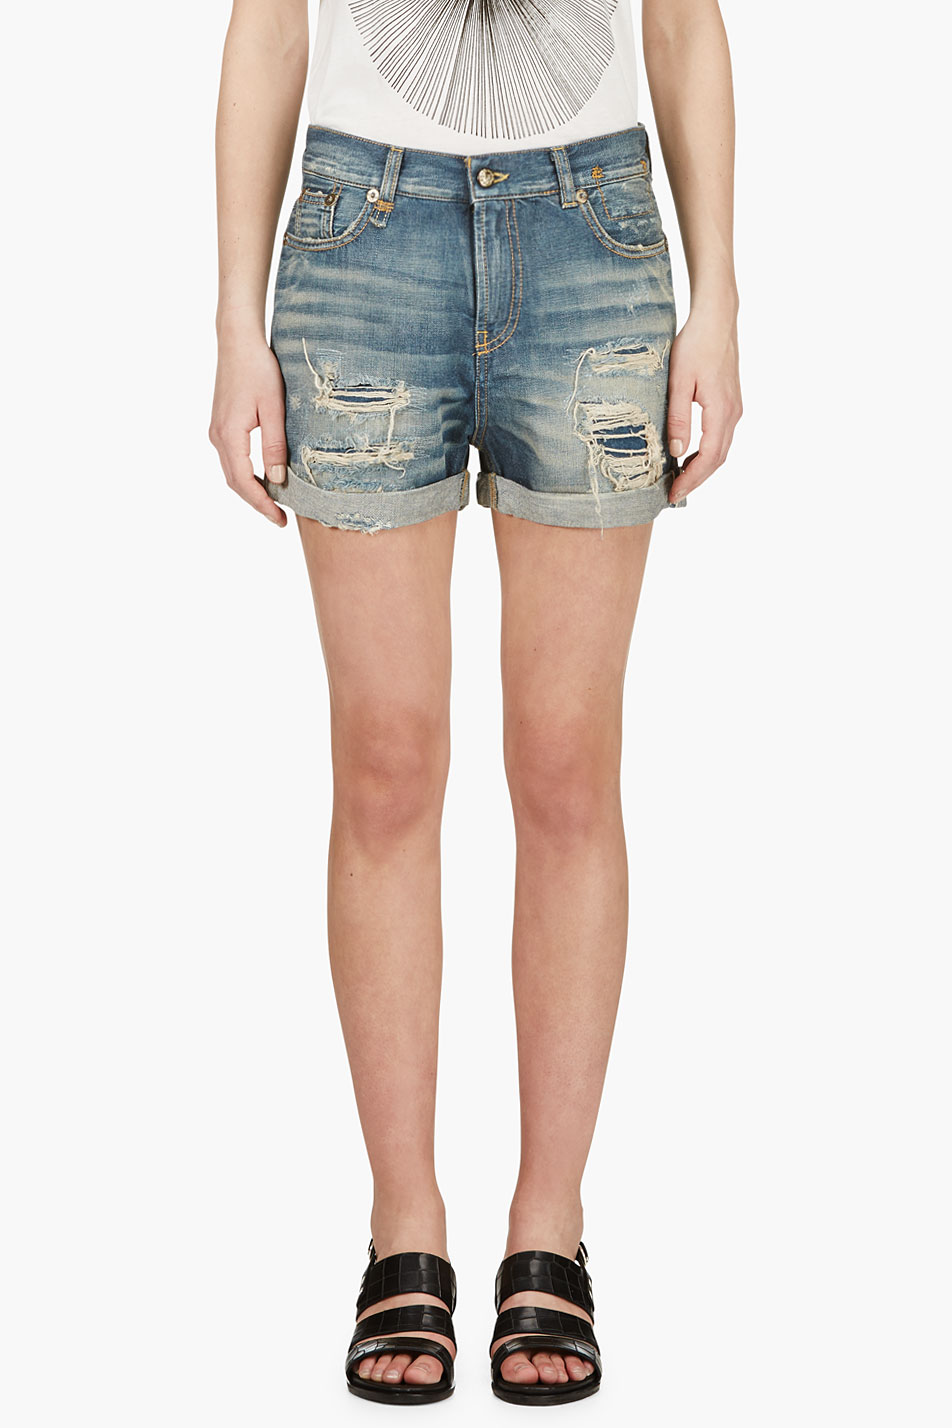 R13 Blue Shredded Denim Shorts